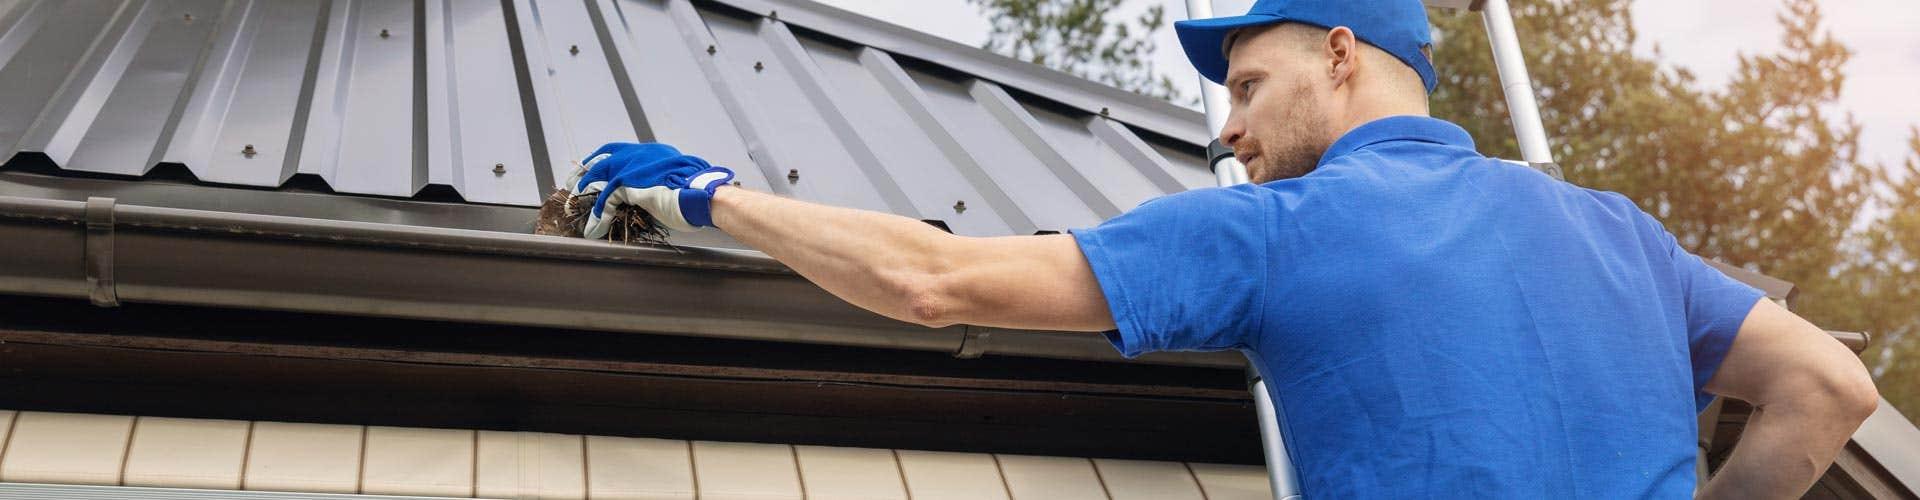 man cleaning a home gutter